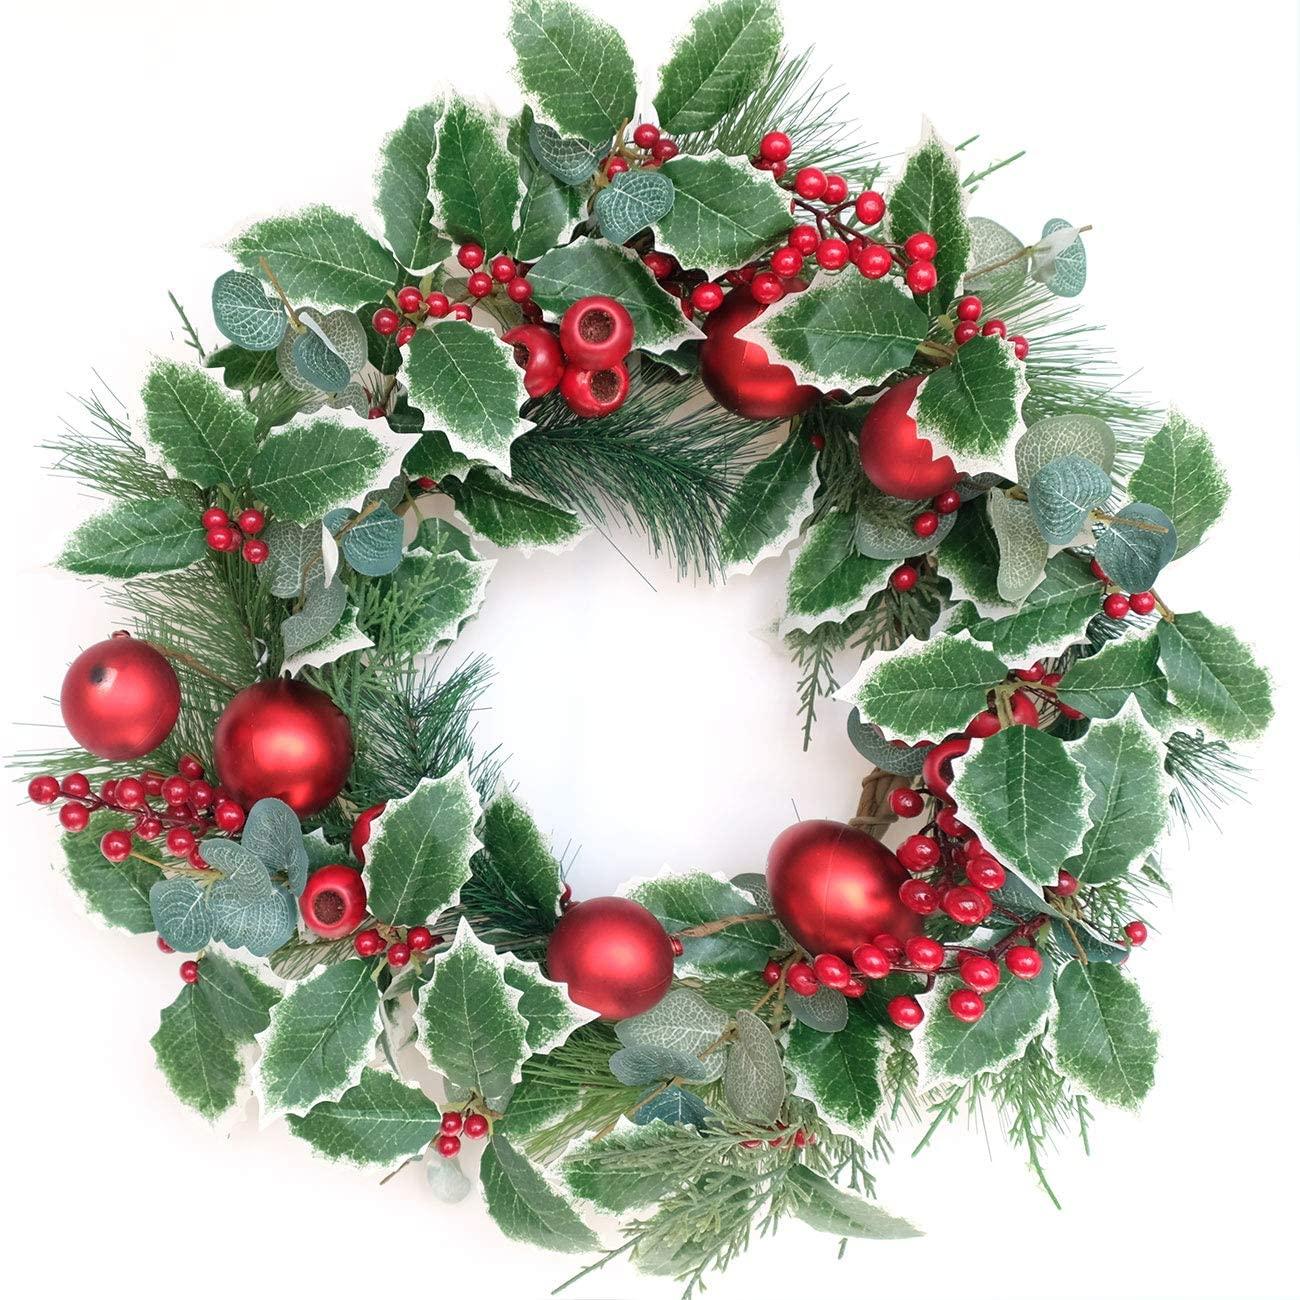 Bibelot Artificial Christmas Wreath with Red Berries Pine Cones Red Balls Decorations Winter Wreath for Front Door Wall Home Decor (20in)